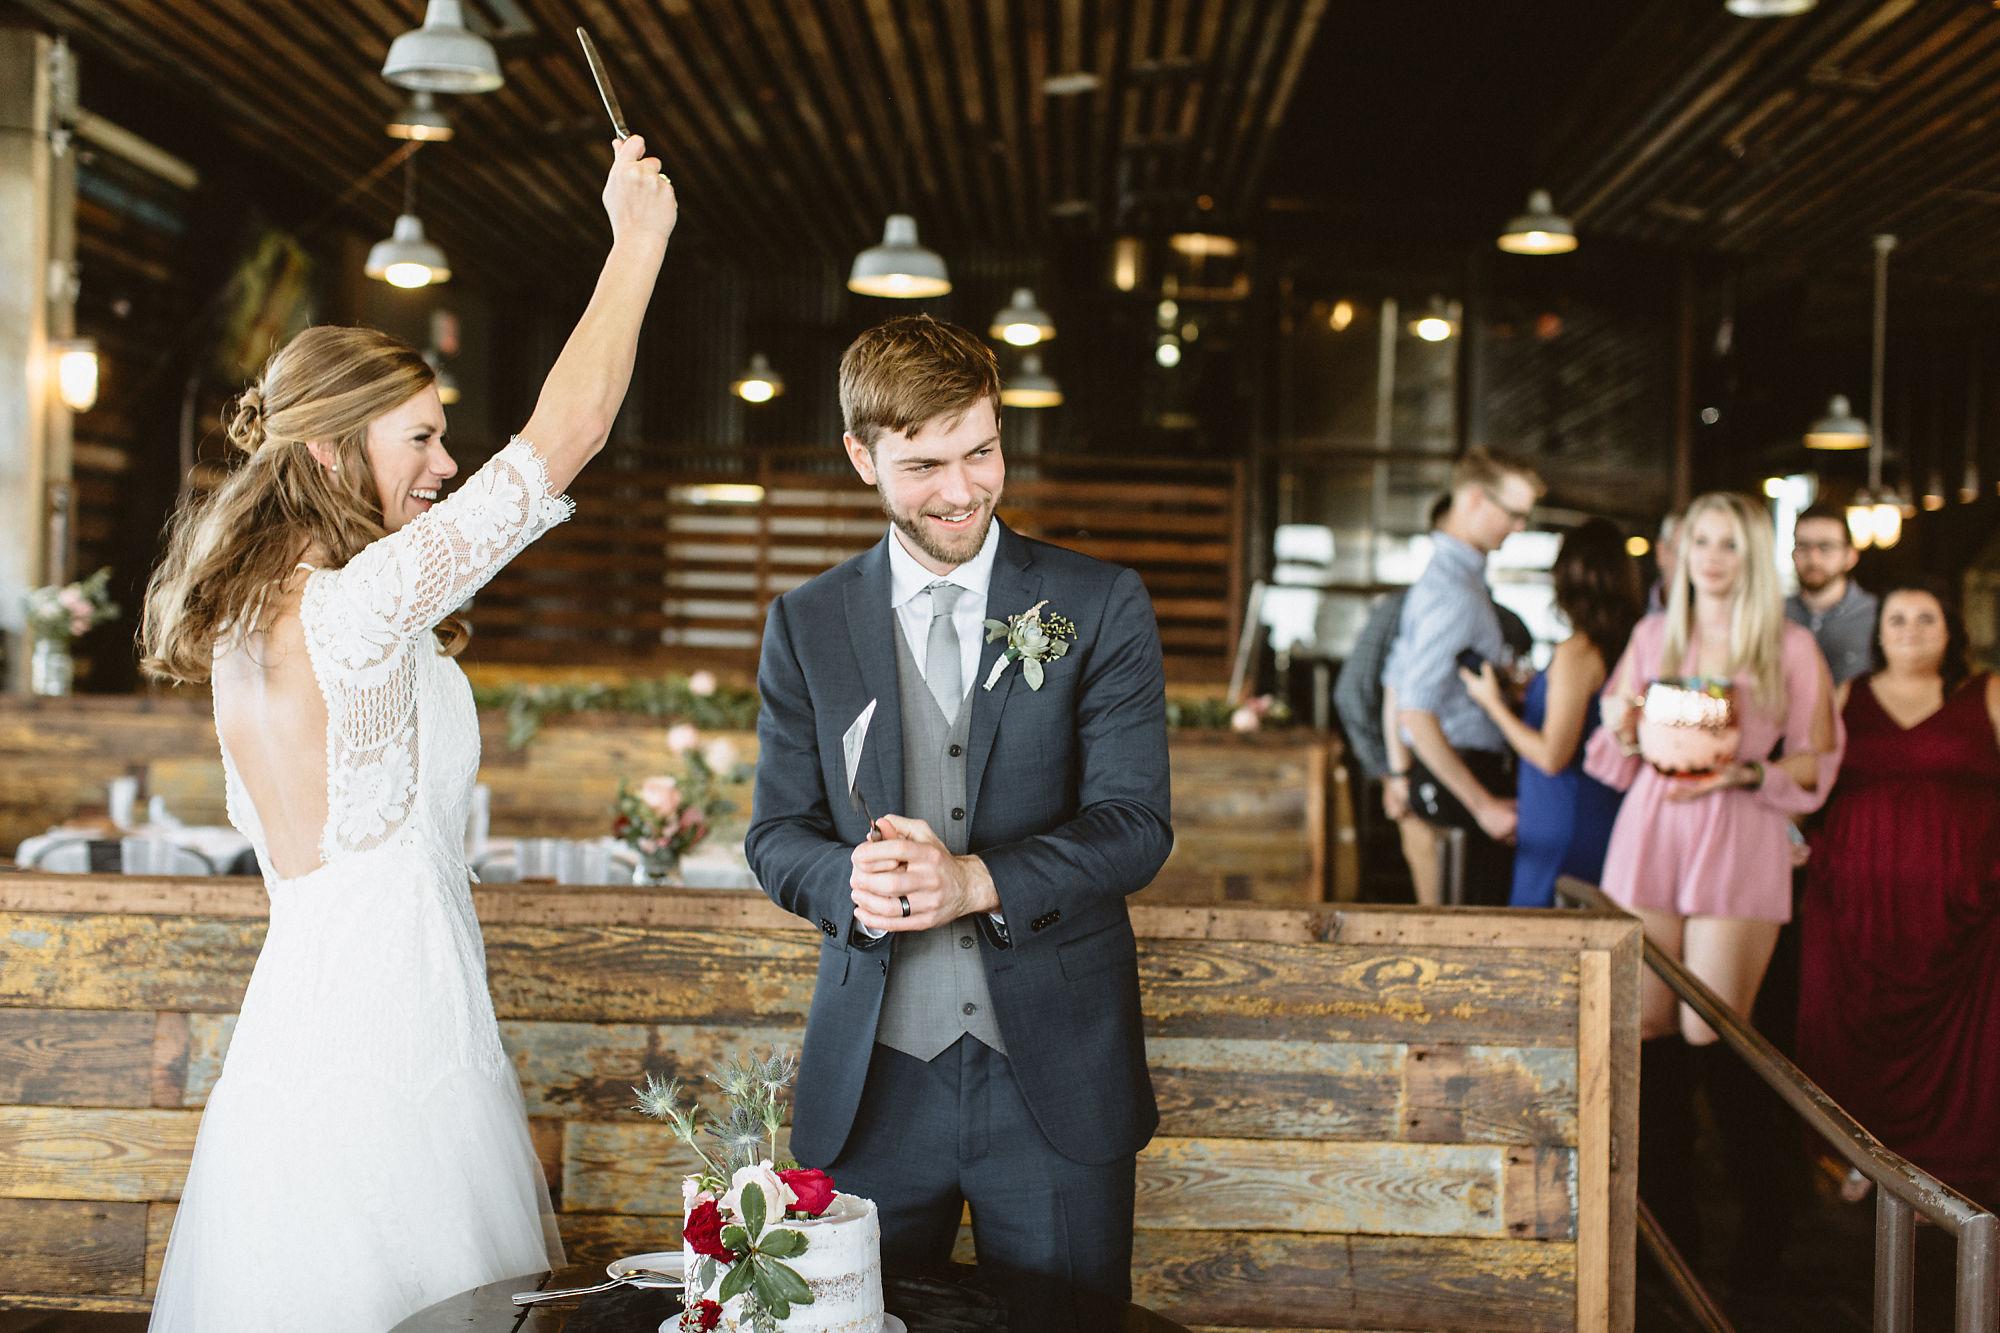 jessica_austin_oasis_brewery_wedding_photos154225.jpg